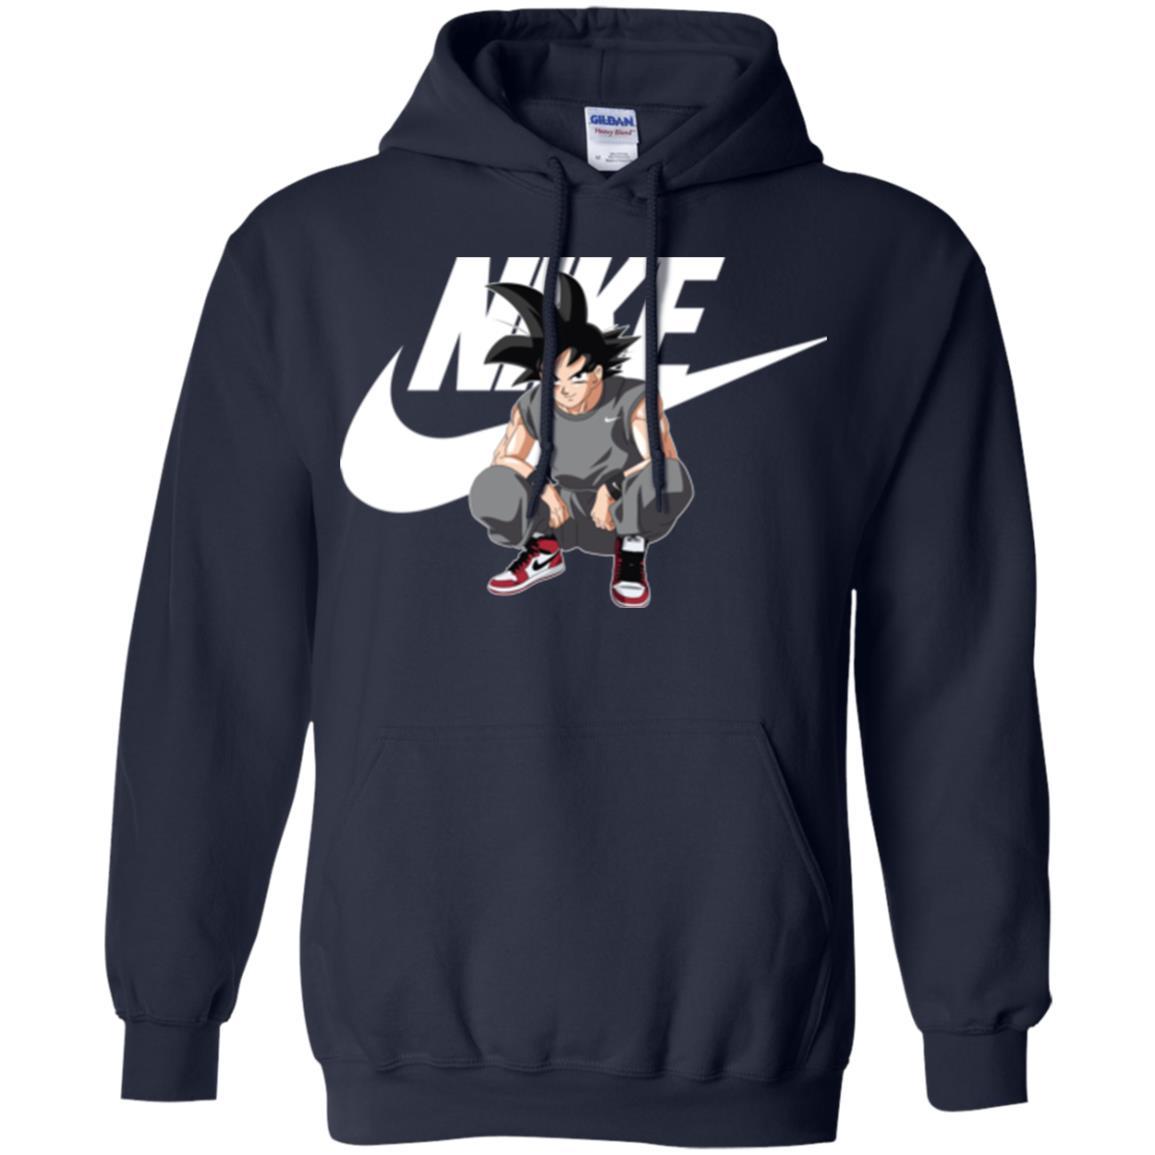 image 255px Songoku Nike Mashup T Shirt, Hoodies, Tank Top